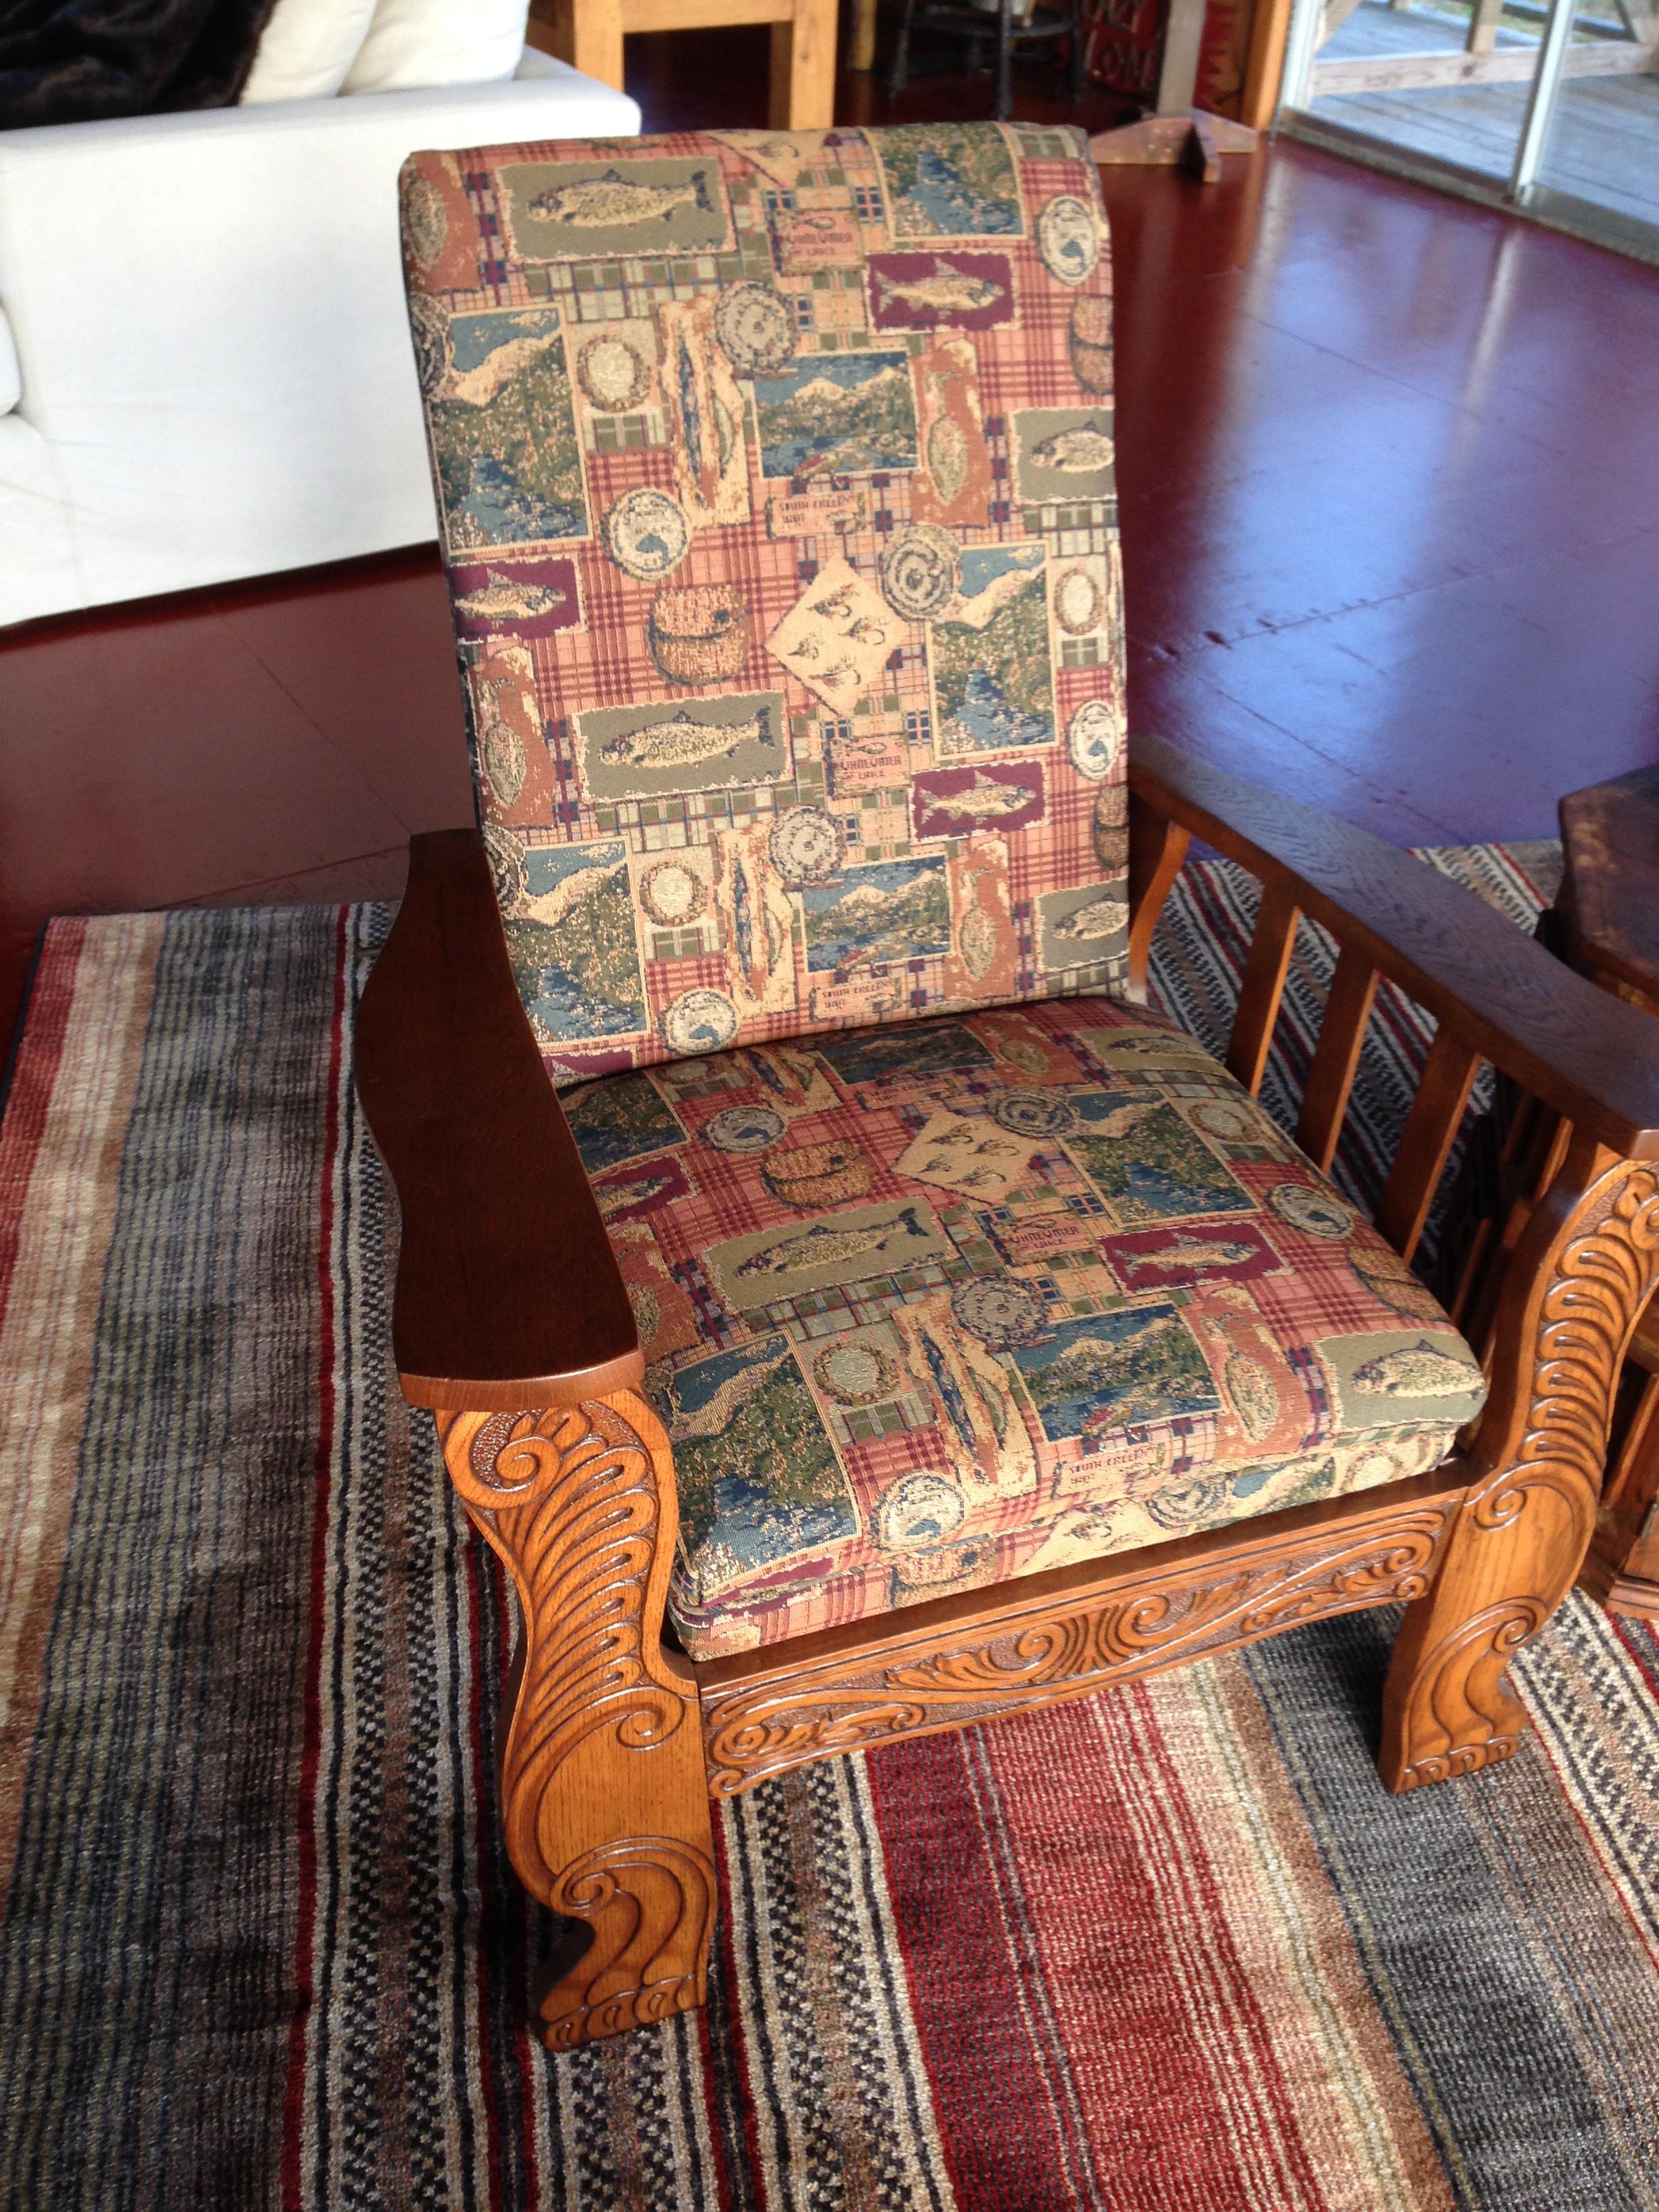 Charmant Quality Furniture Repair U0026 Restoration 5044 E Admiral Pl, Tulsa, OK 74115    YP.com